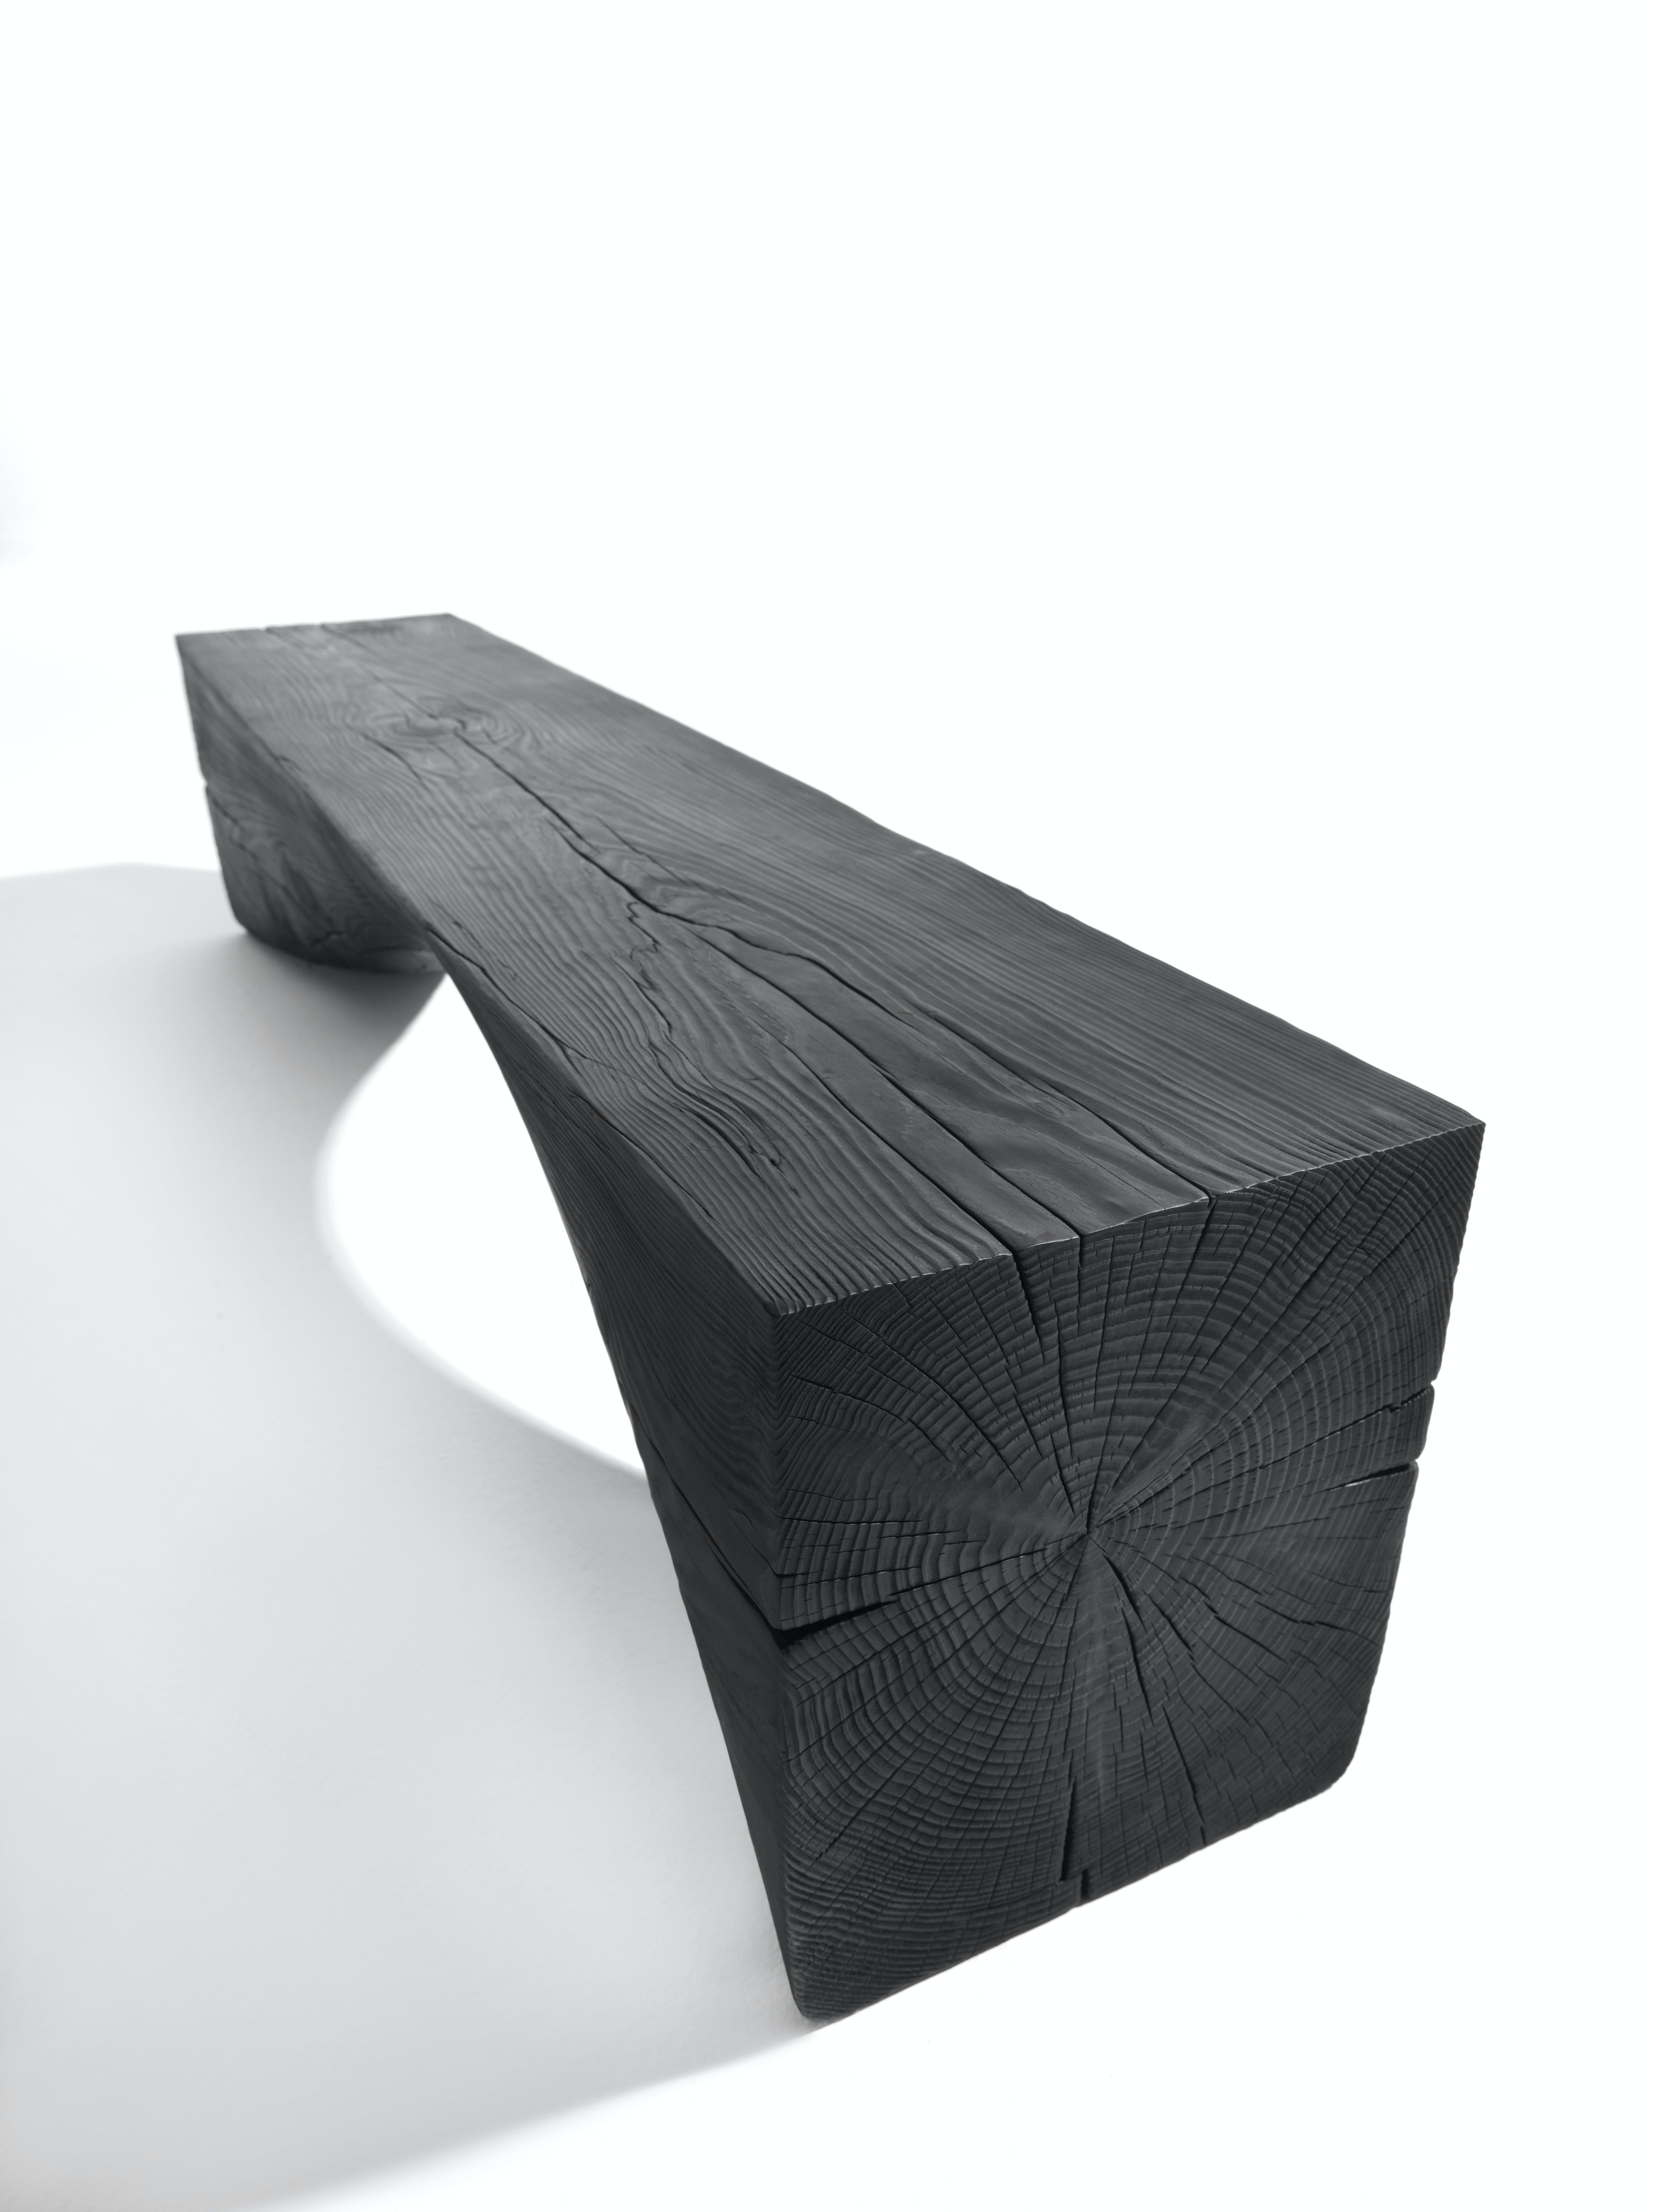 Curve Design Brodie Neill 1